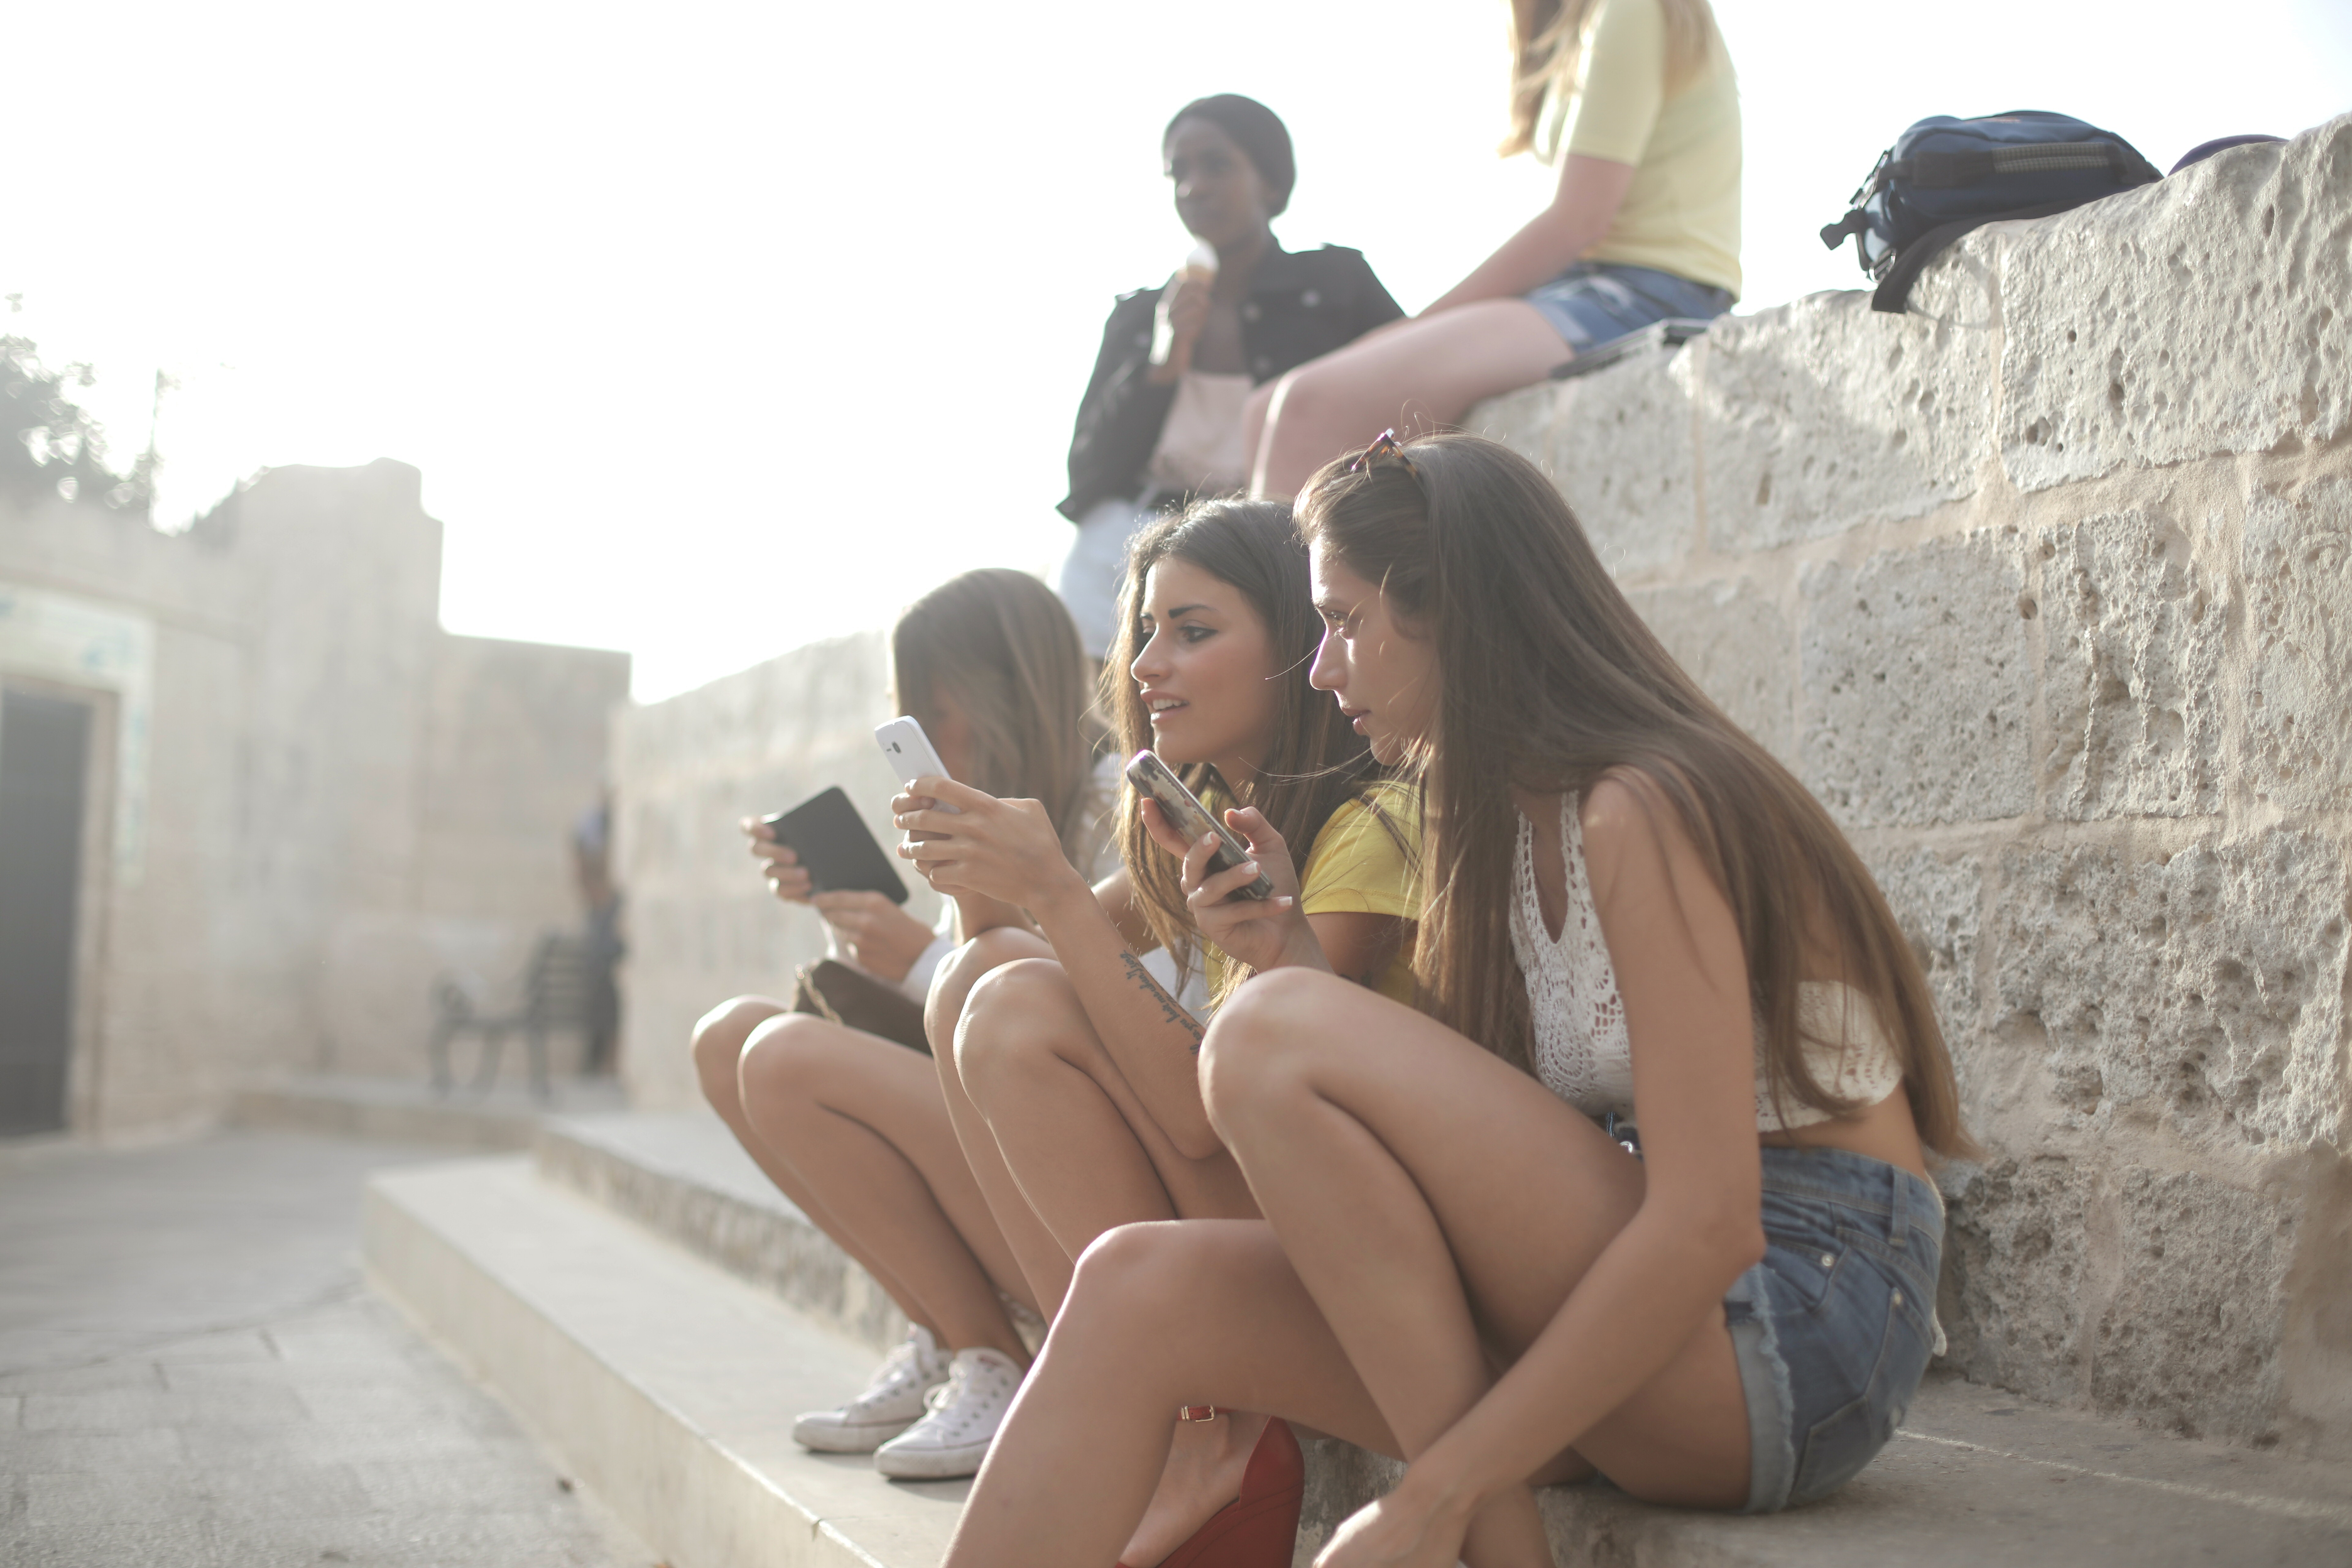 3-women-sitting-on-concrete-steps-3989936